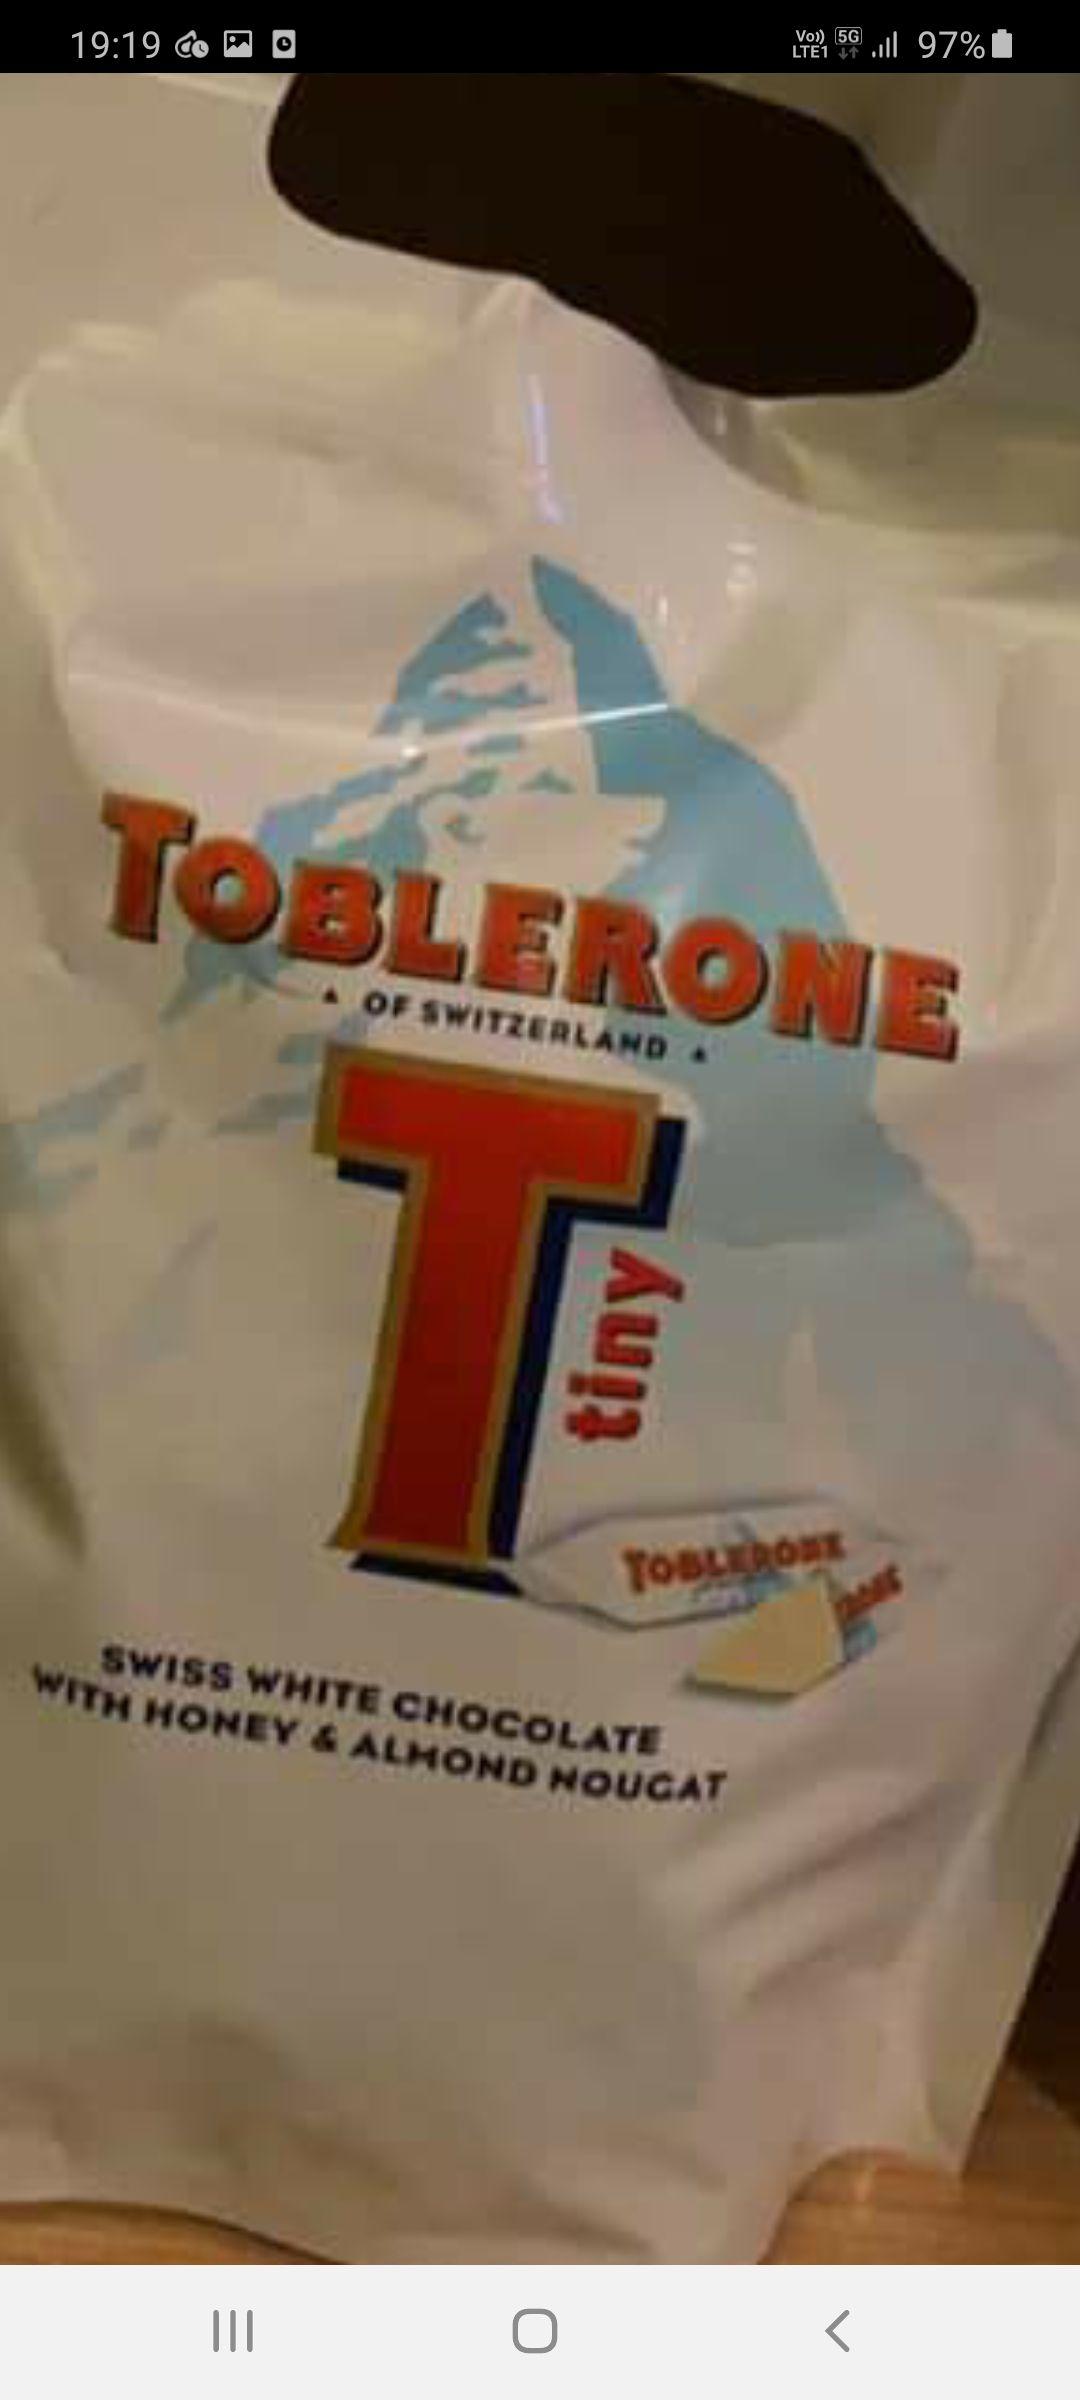 Toblerone White Chocolate Tiny's Pouch 340g are £1 @ Asda INSTORE (Chadderton)